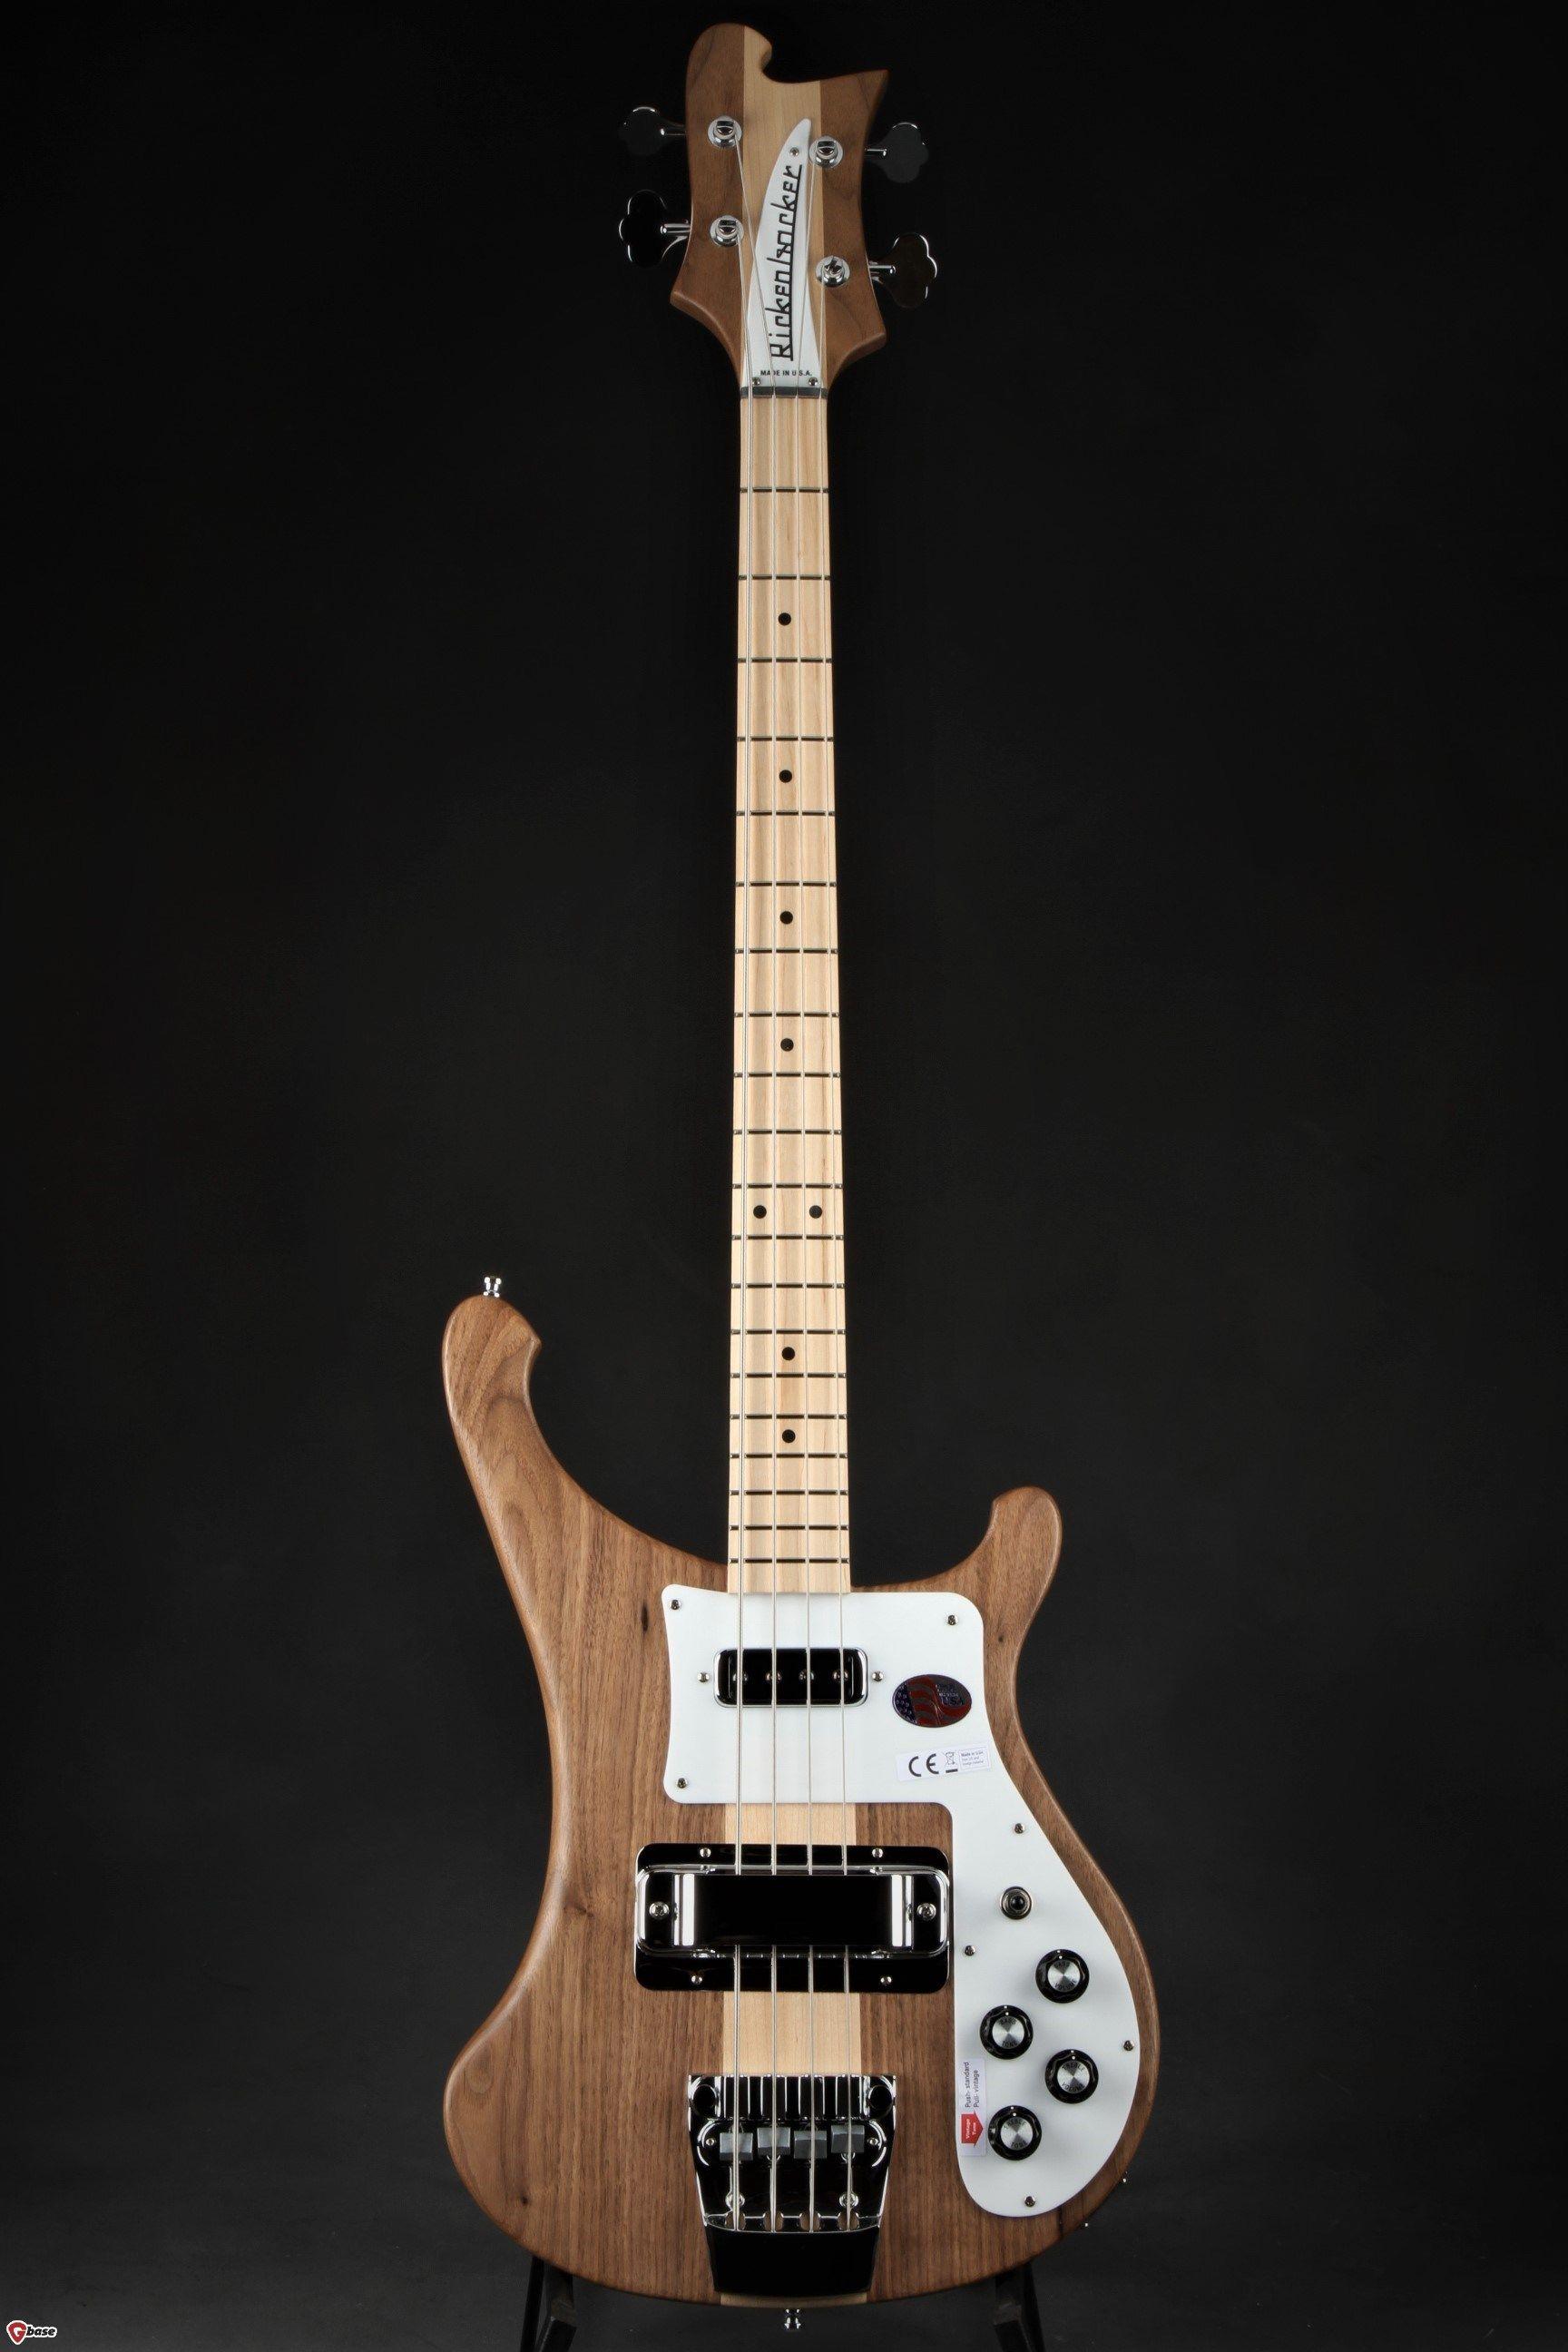 1958 Rickenbacker 325 Wiring Diagram Explained Diagrams 360 Vintage Glen Harness Electrical Work Guitar